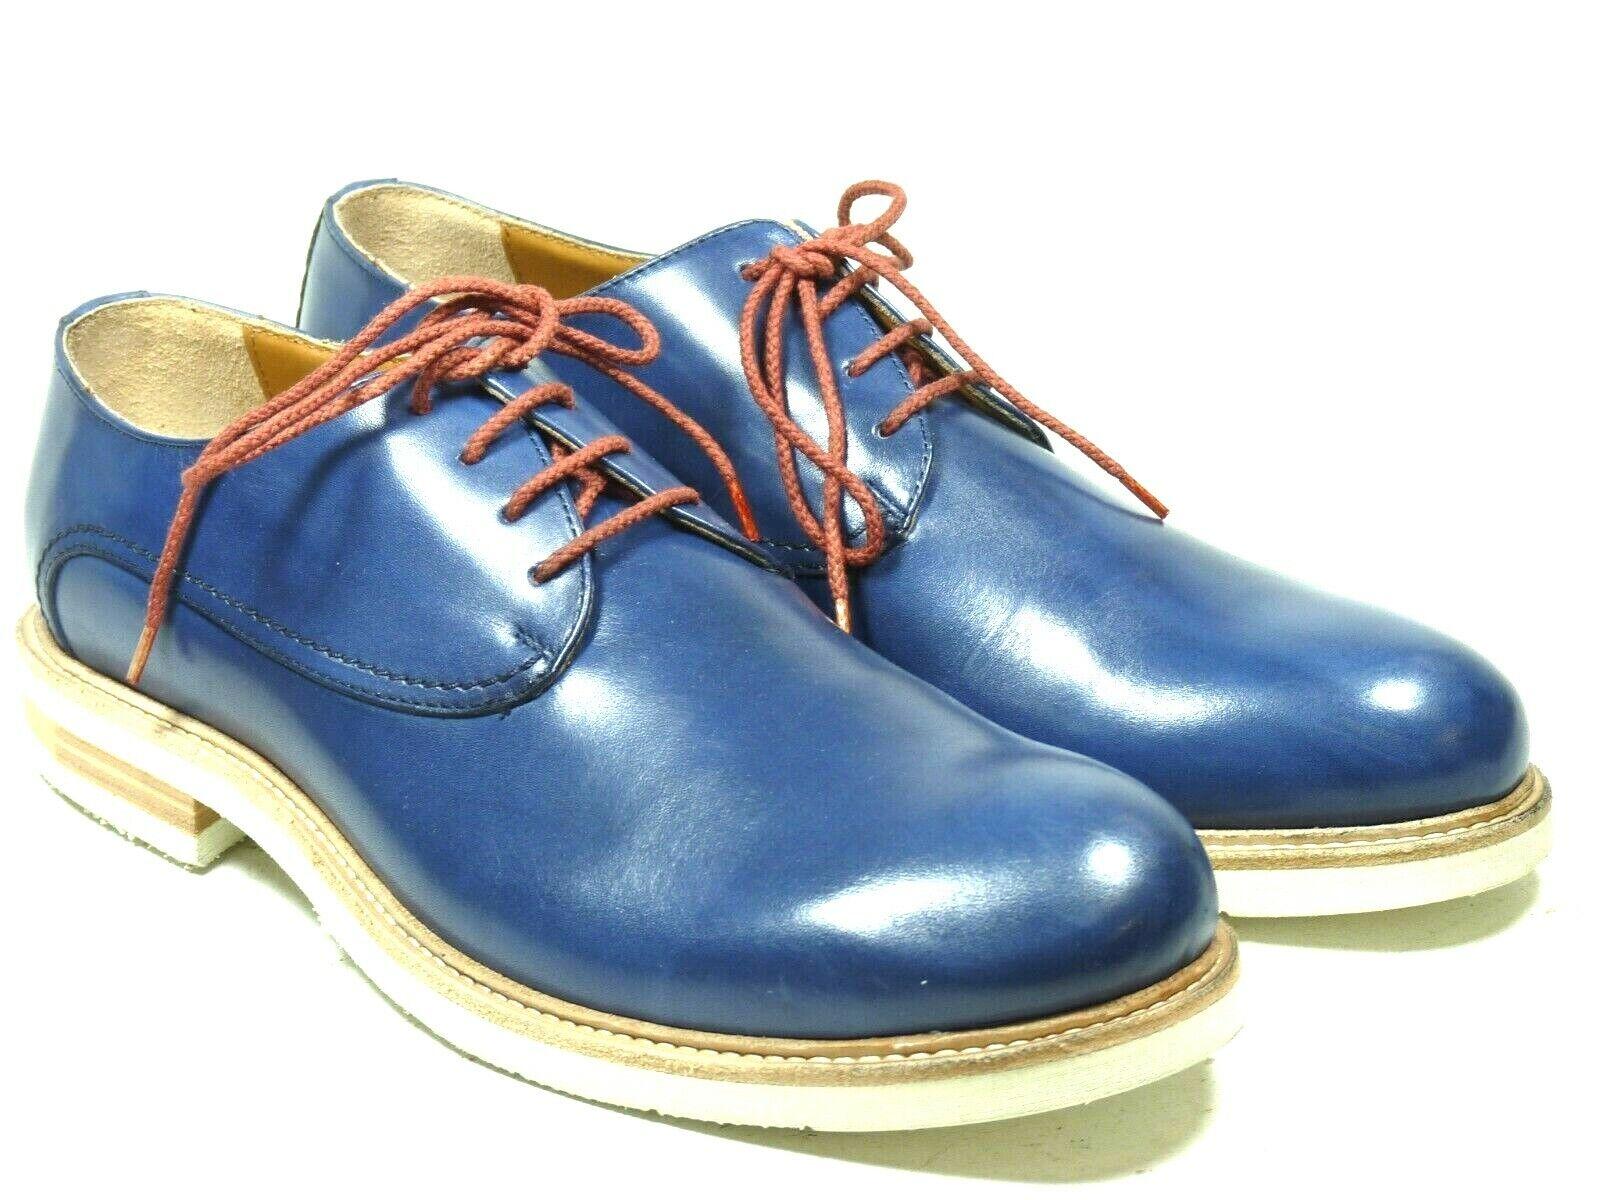 Hamlet Echtleder Herrenschuhe Plain Derby 227 Vitello Blau Blau Blau EUR 42 a7504a